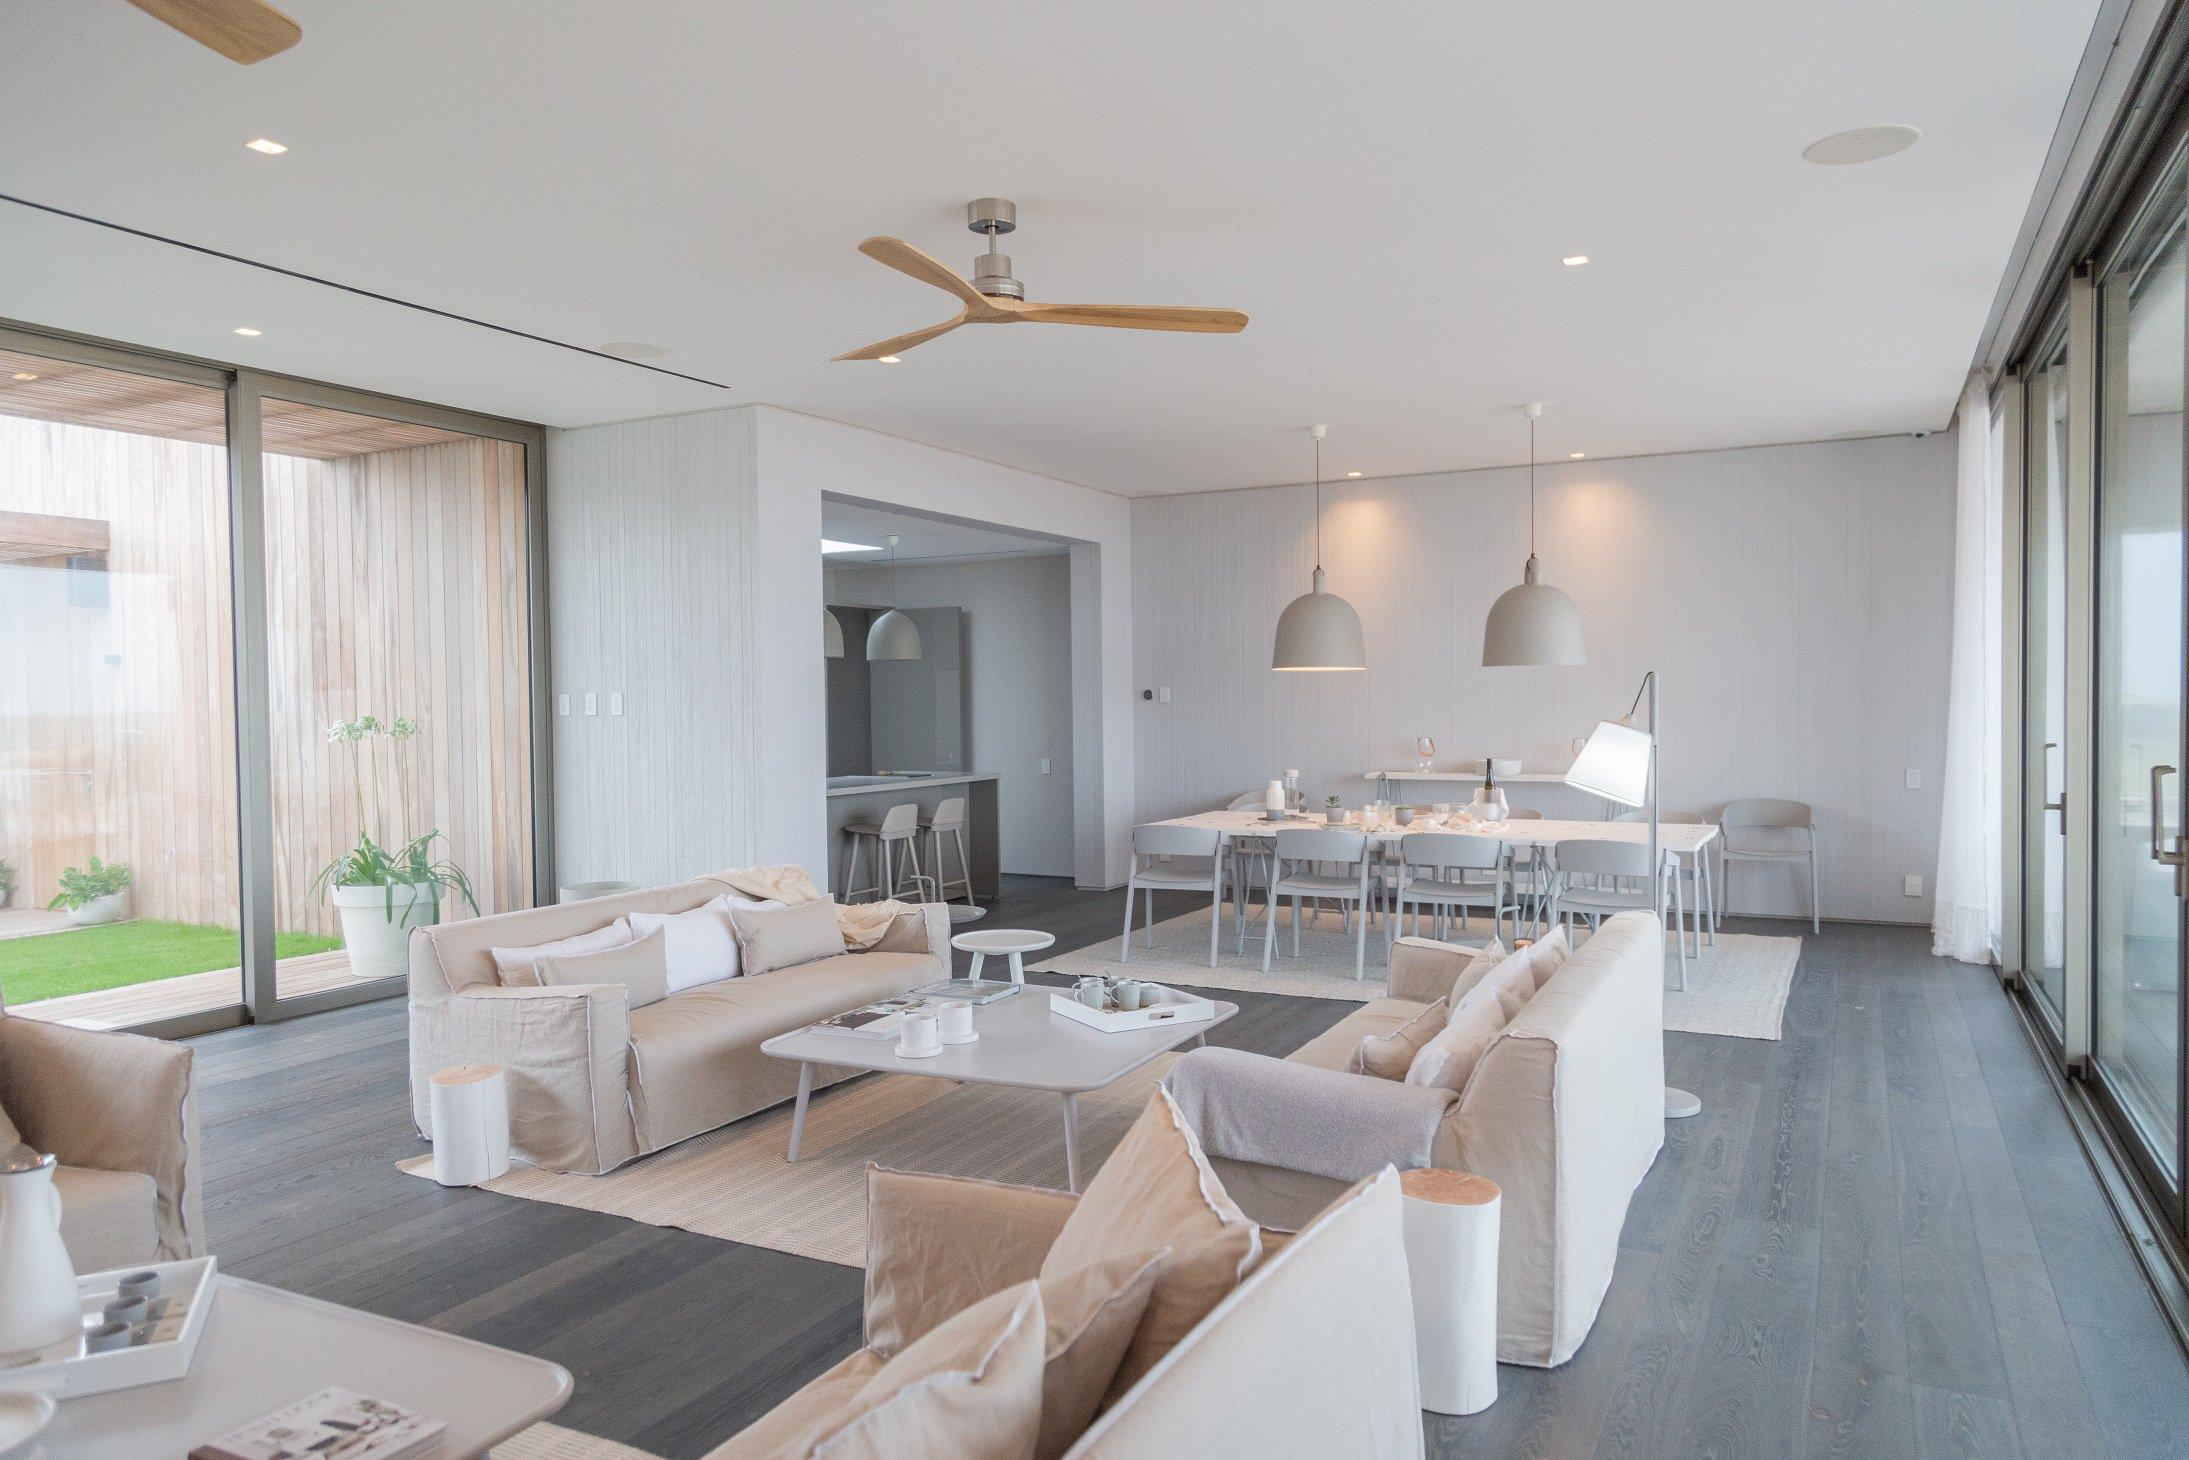 Beach House - Uruguay - FB Hout